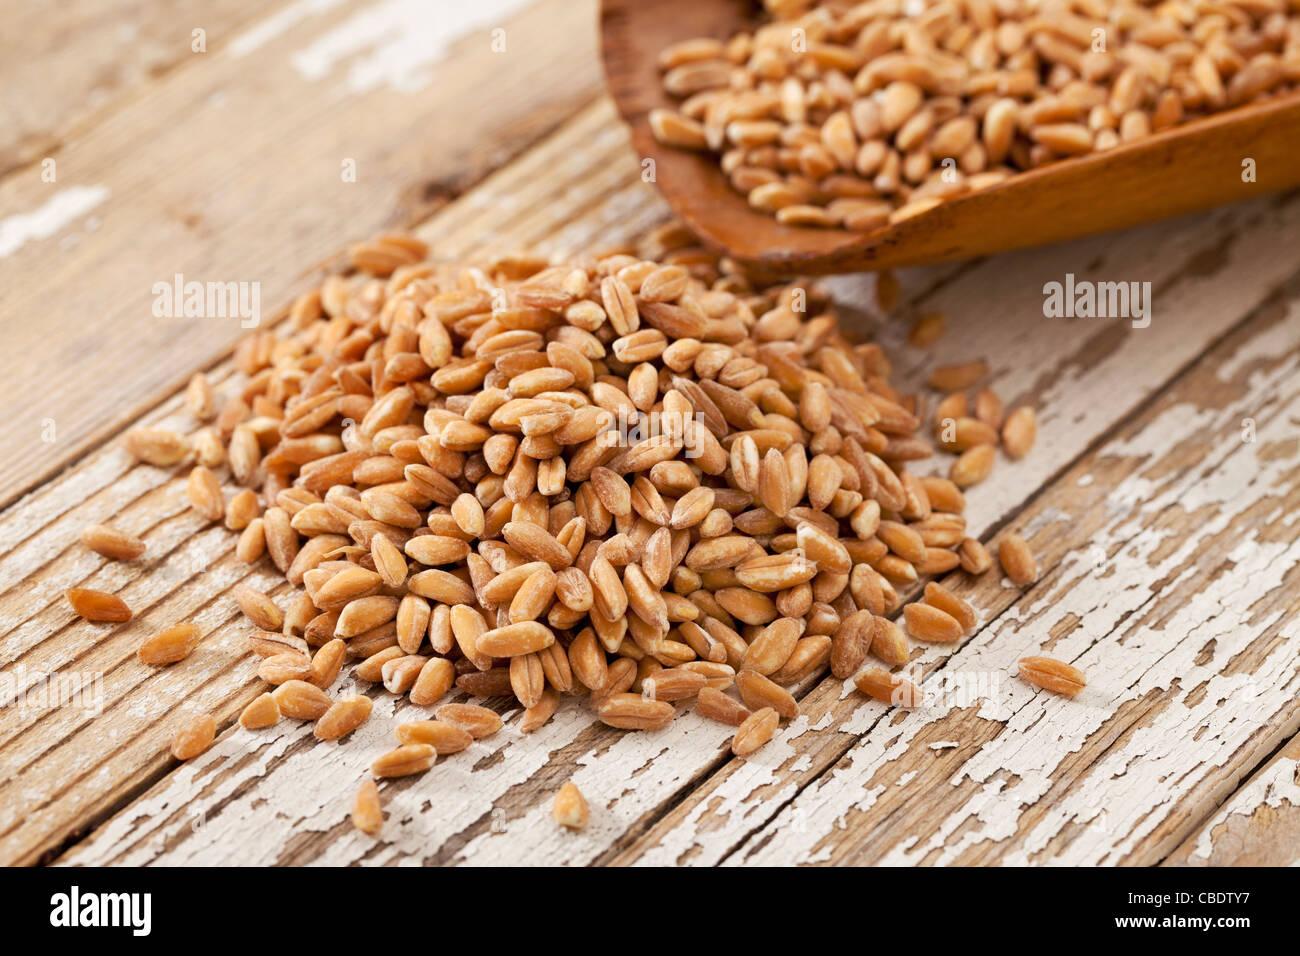 Boca de grano de trigo Farro (antigua) en boca de madera rústica contra la superficie de madera pintada en Imagen De Stock